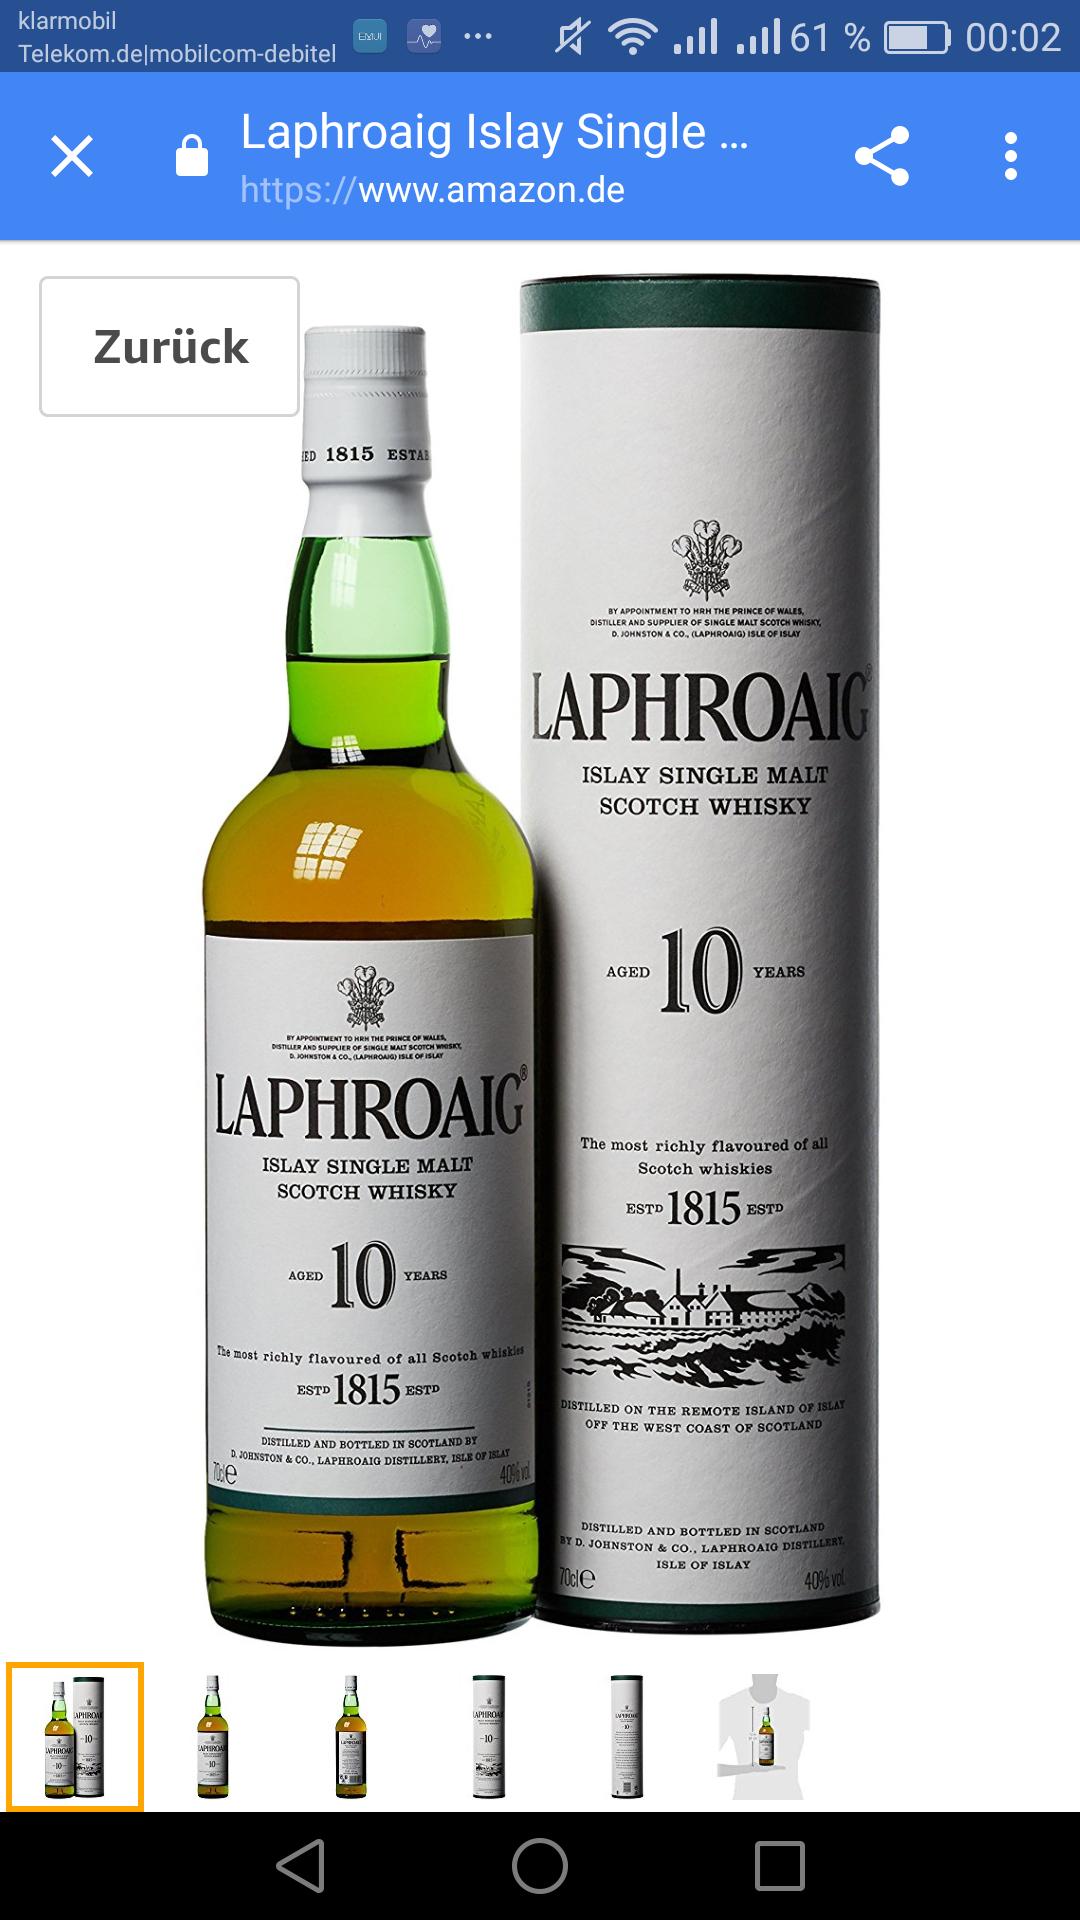 LaphroaigIslaySingleMaltScotch Whisky 10Jahre(1 x 0.7) amazon (prime), oder Buchtrick